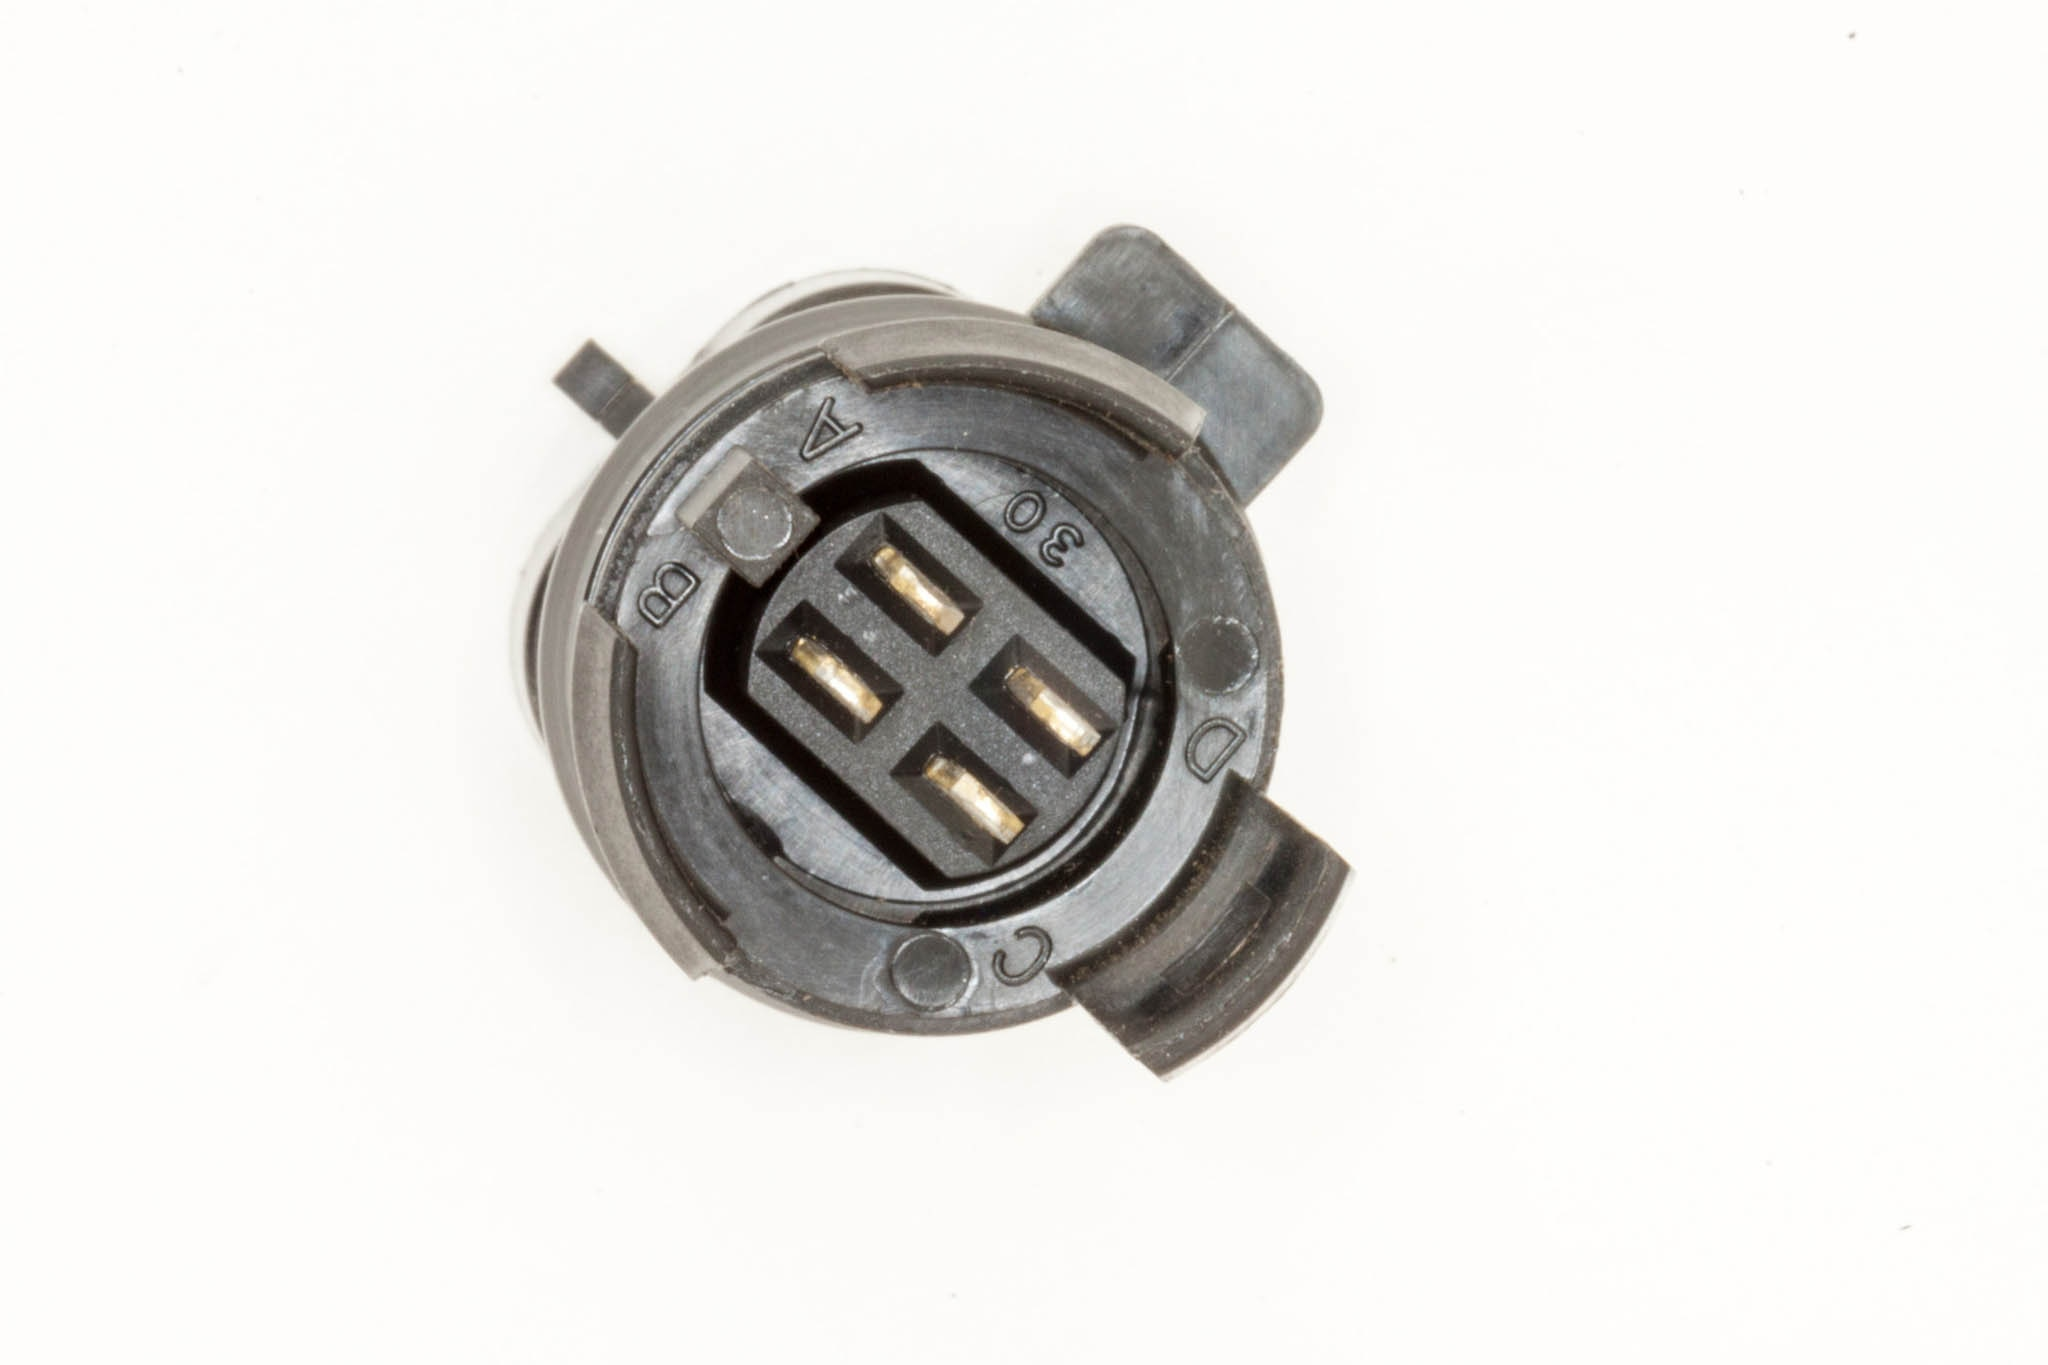 700r4 Lockup Wiring Diagram On Wiring 700r4 Lockup Torque Converter